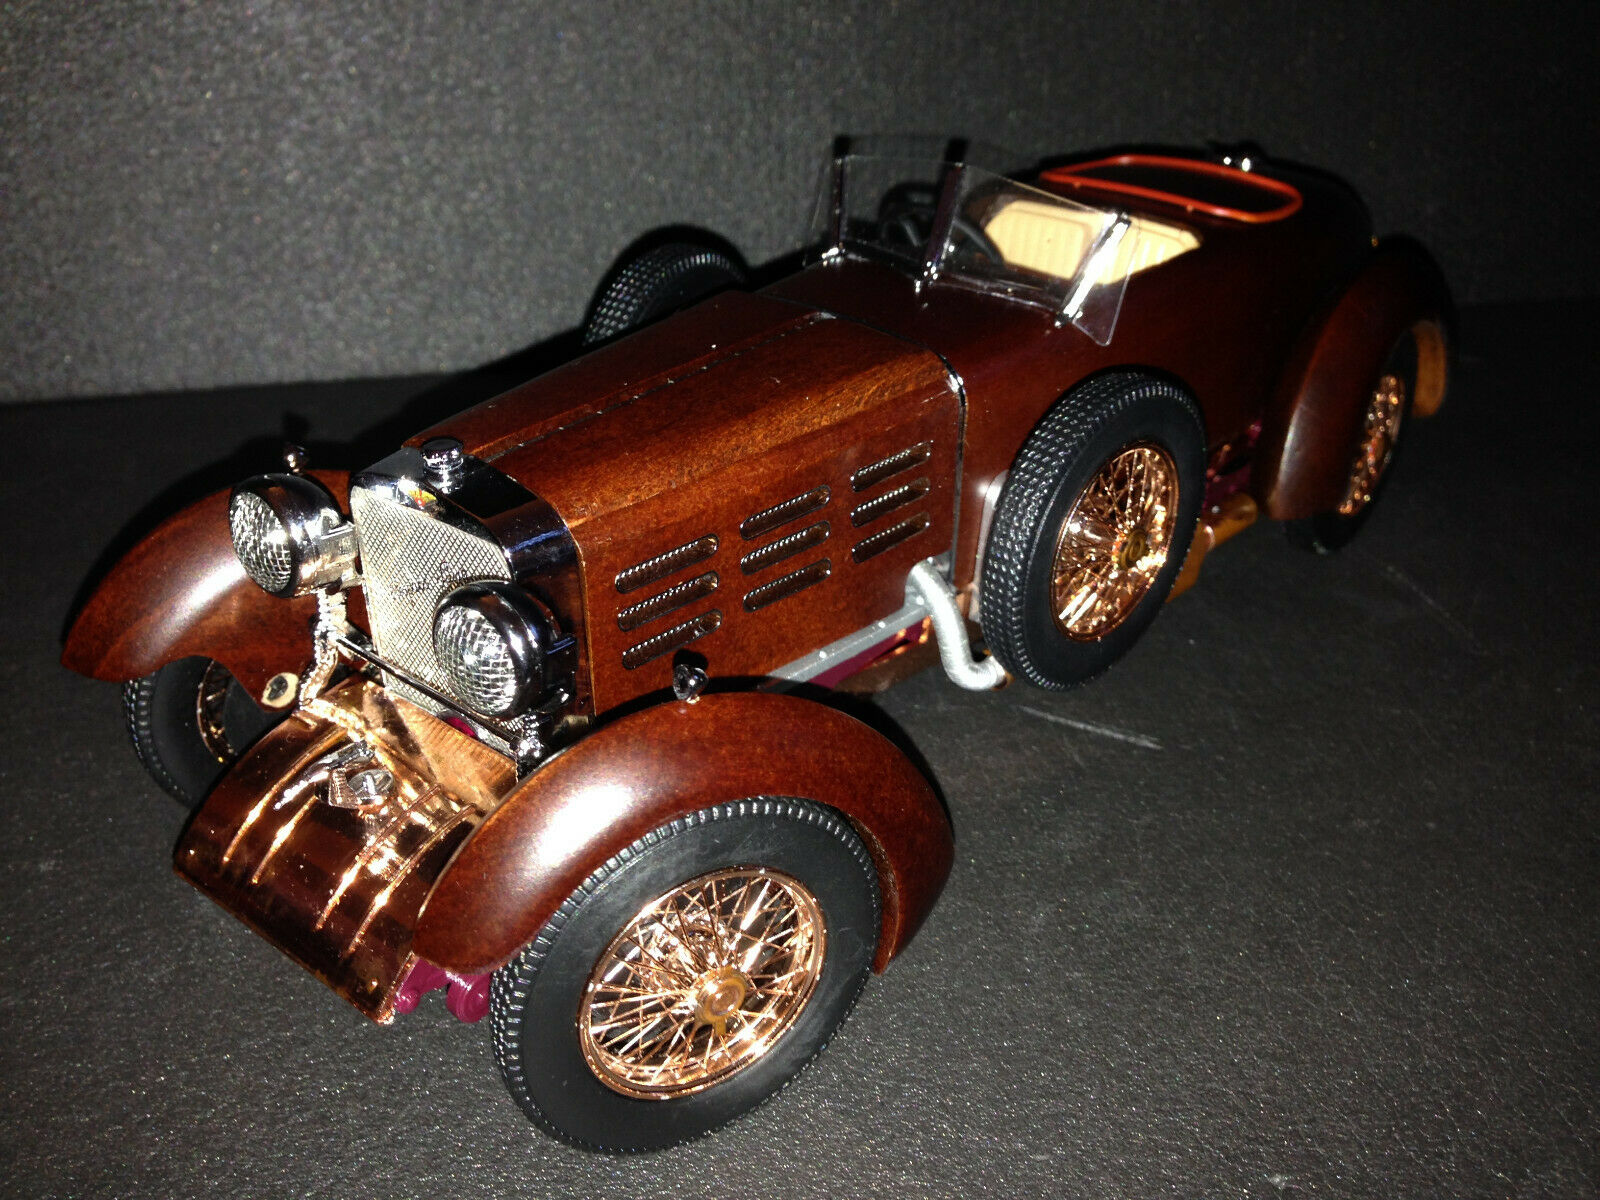 Hispano-Suiza H6C 1924 Dubonnet Boulogne Targa Florio Speedster  Tulipwood  1 18